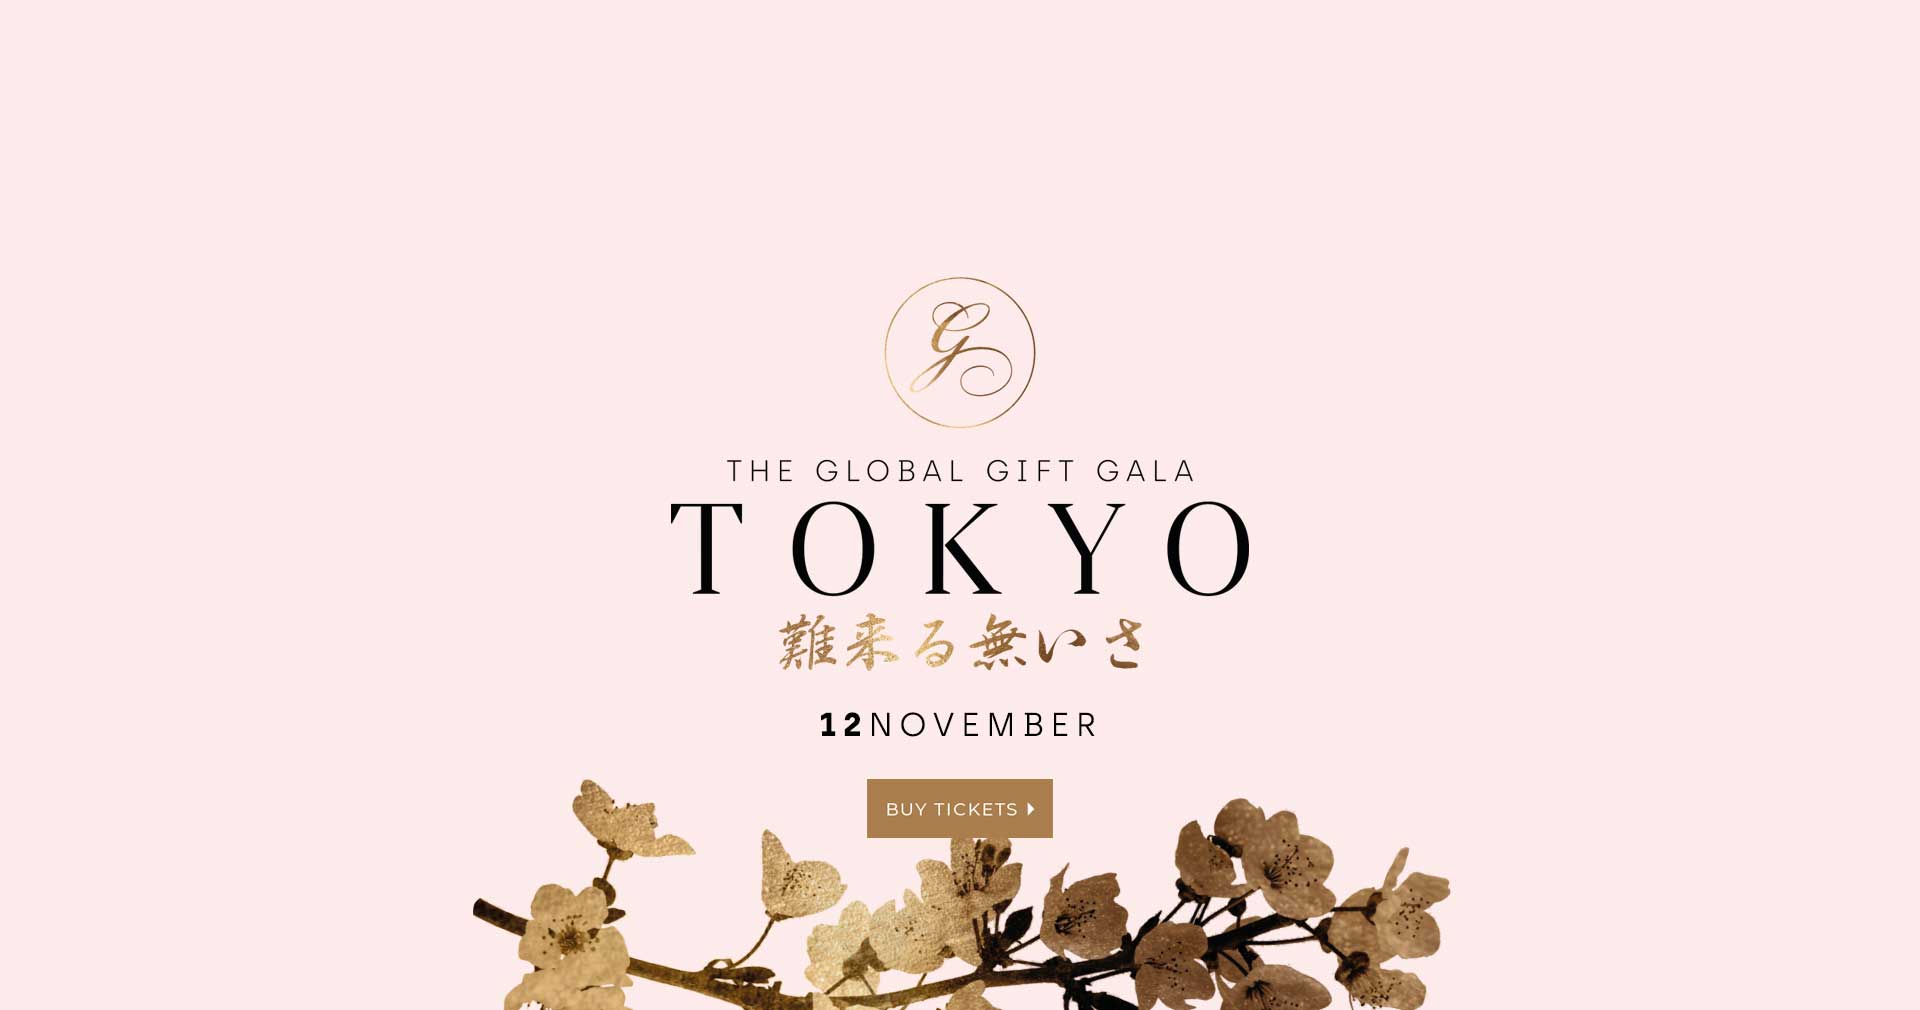 The Global Gift Gala Tokyo